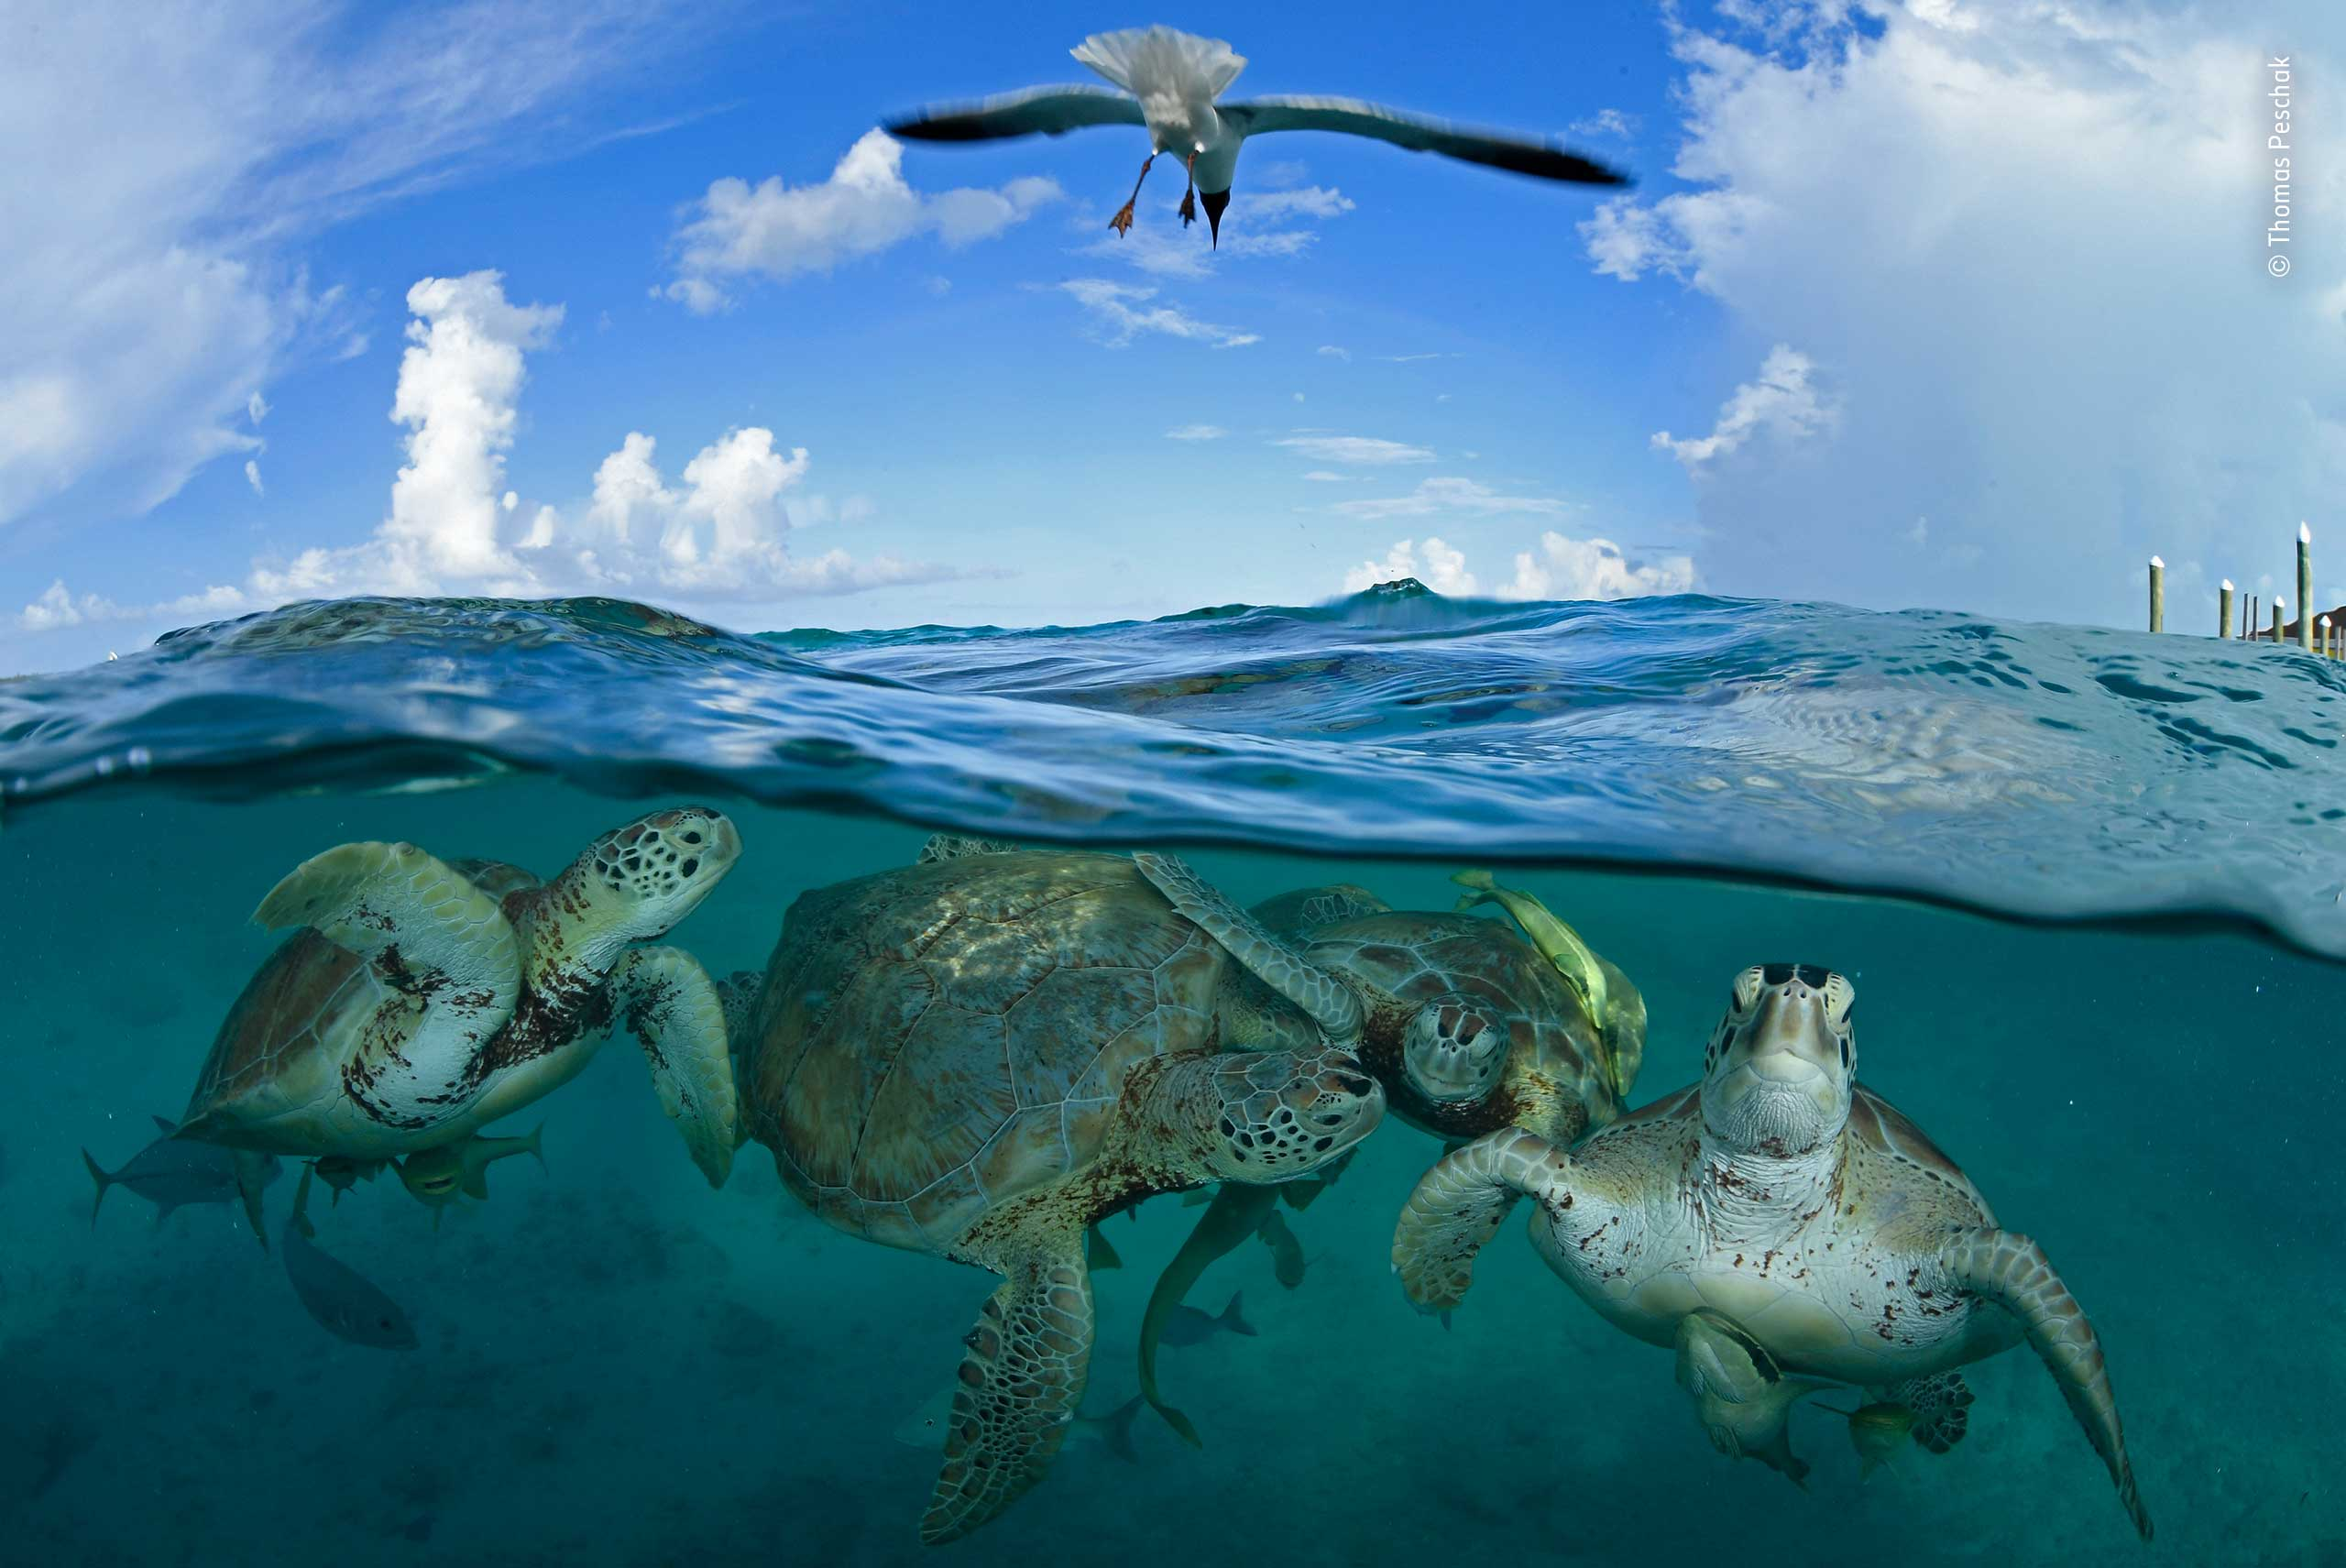 turtle-time-machine.jpg